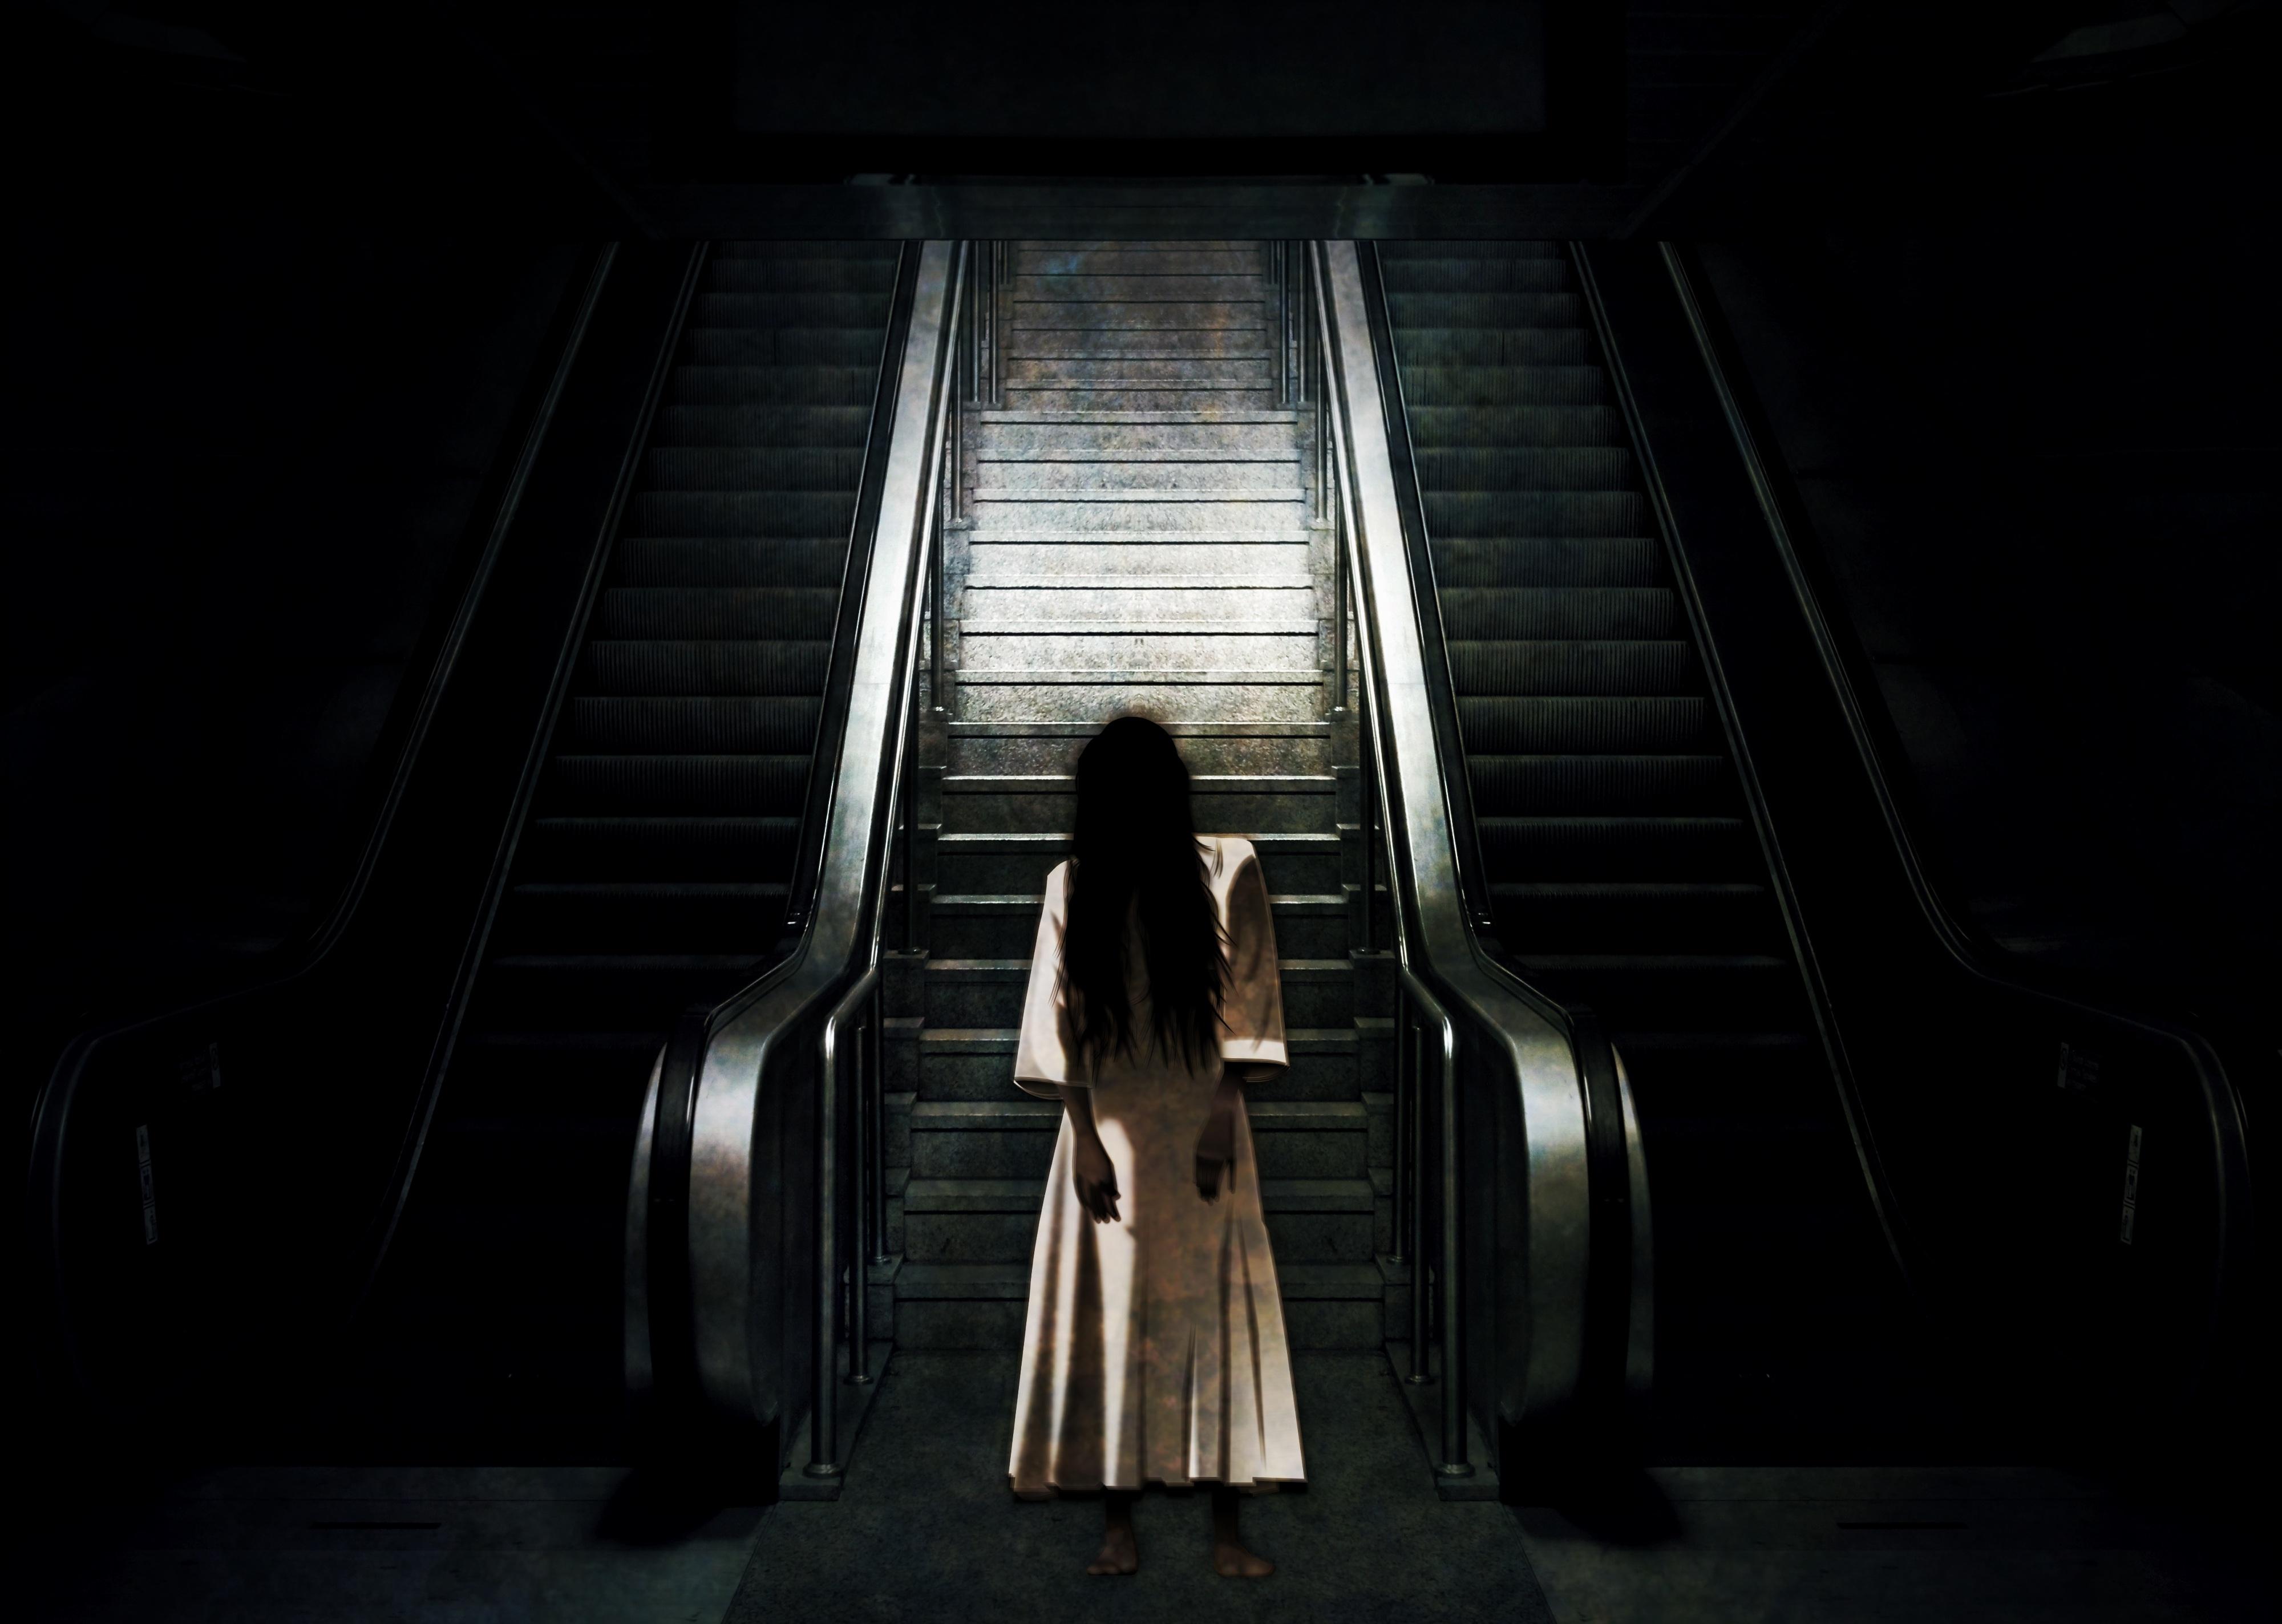 horrorfilmek_pszichologiaja.jpg